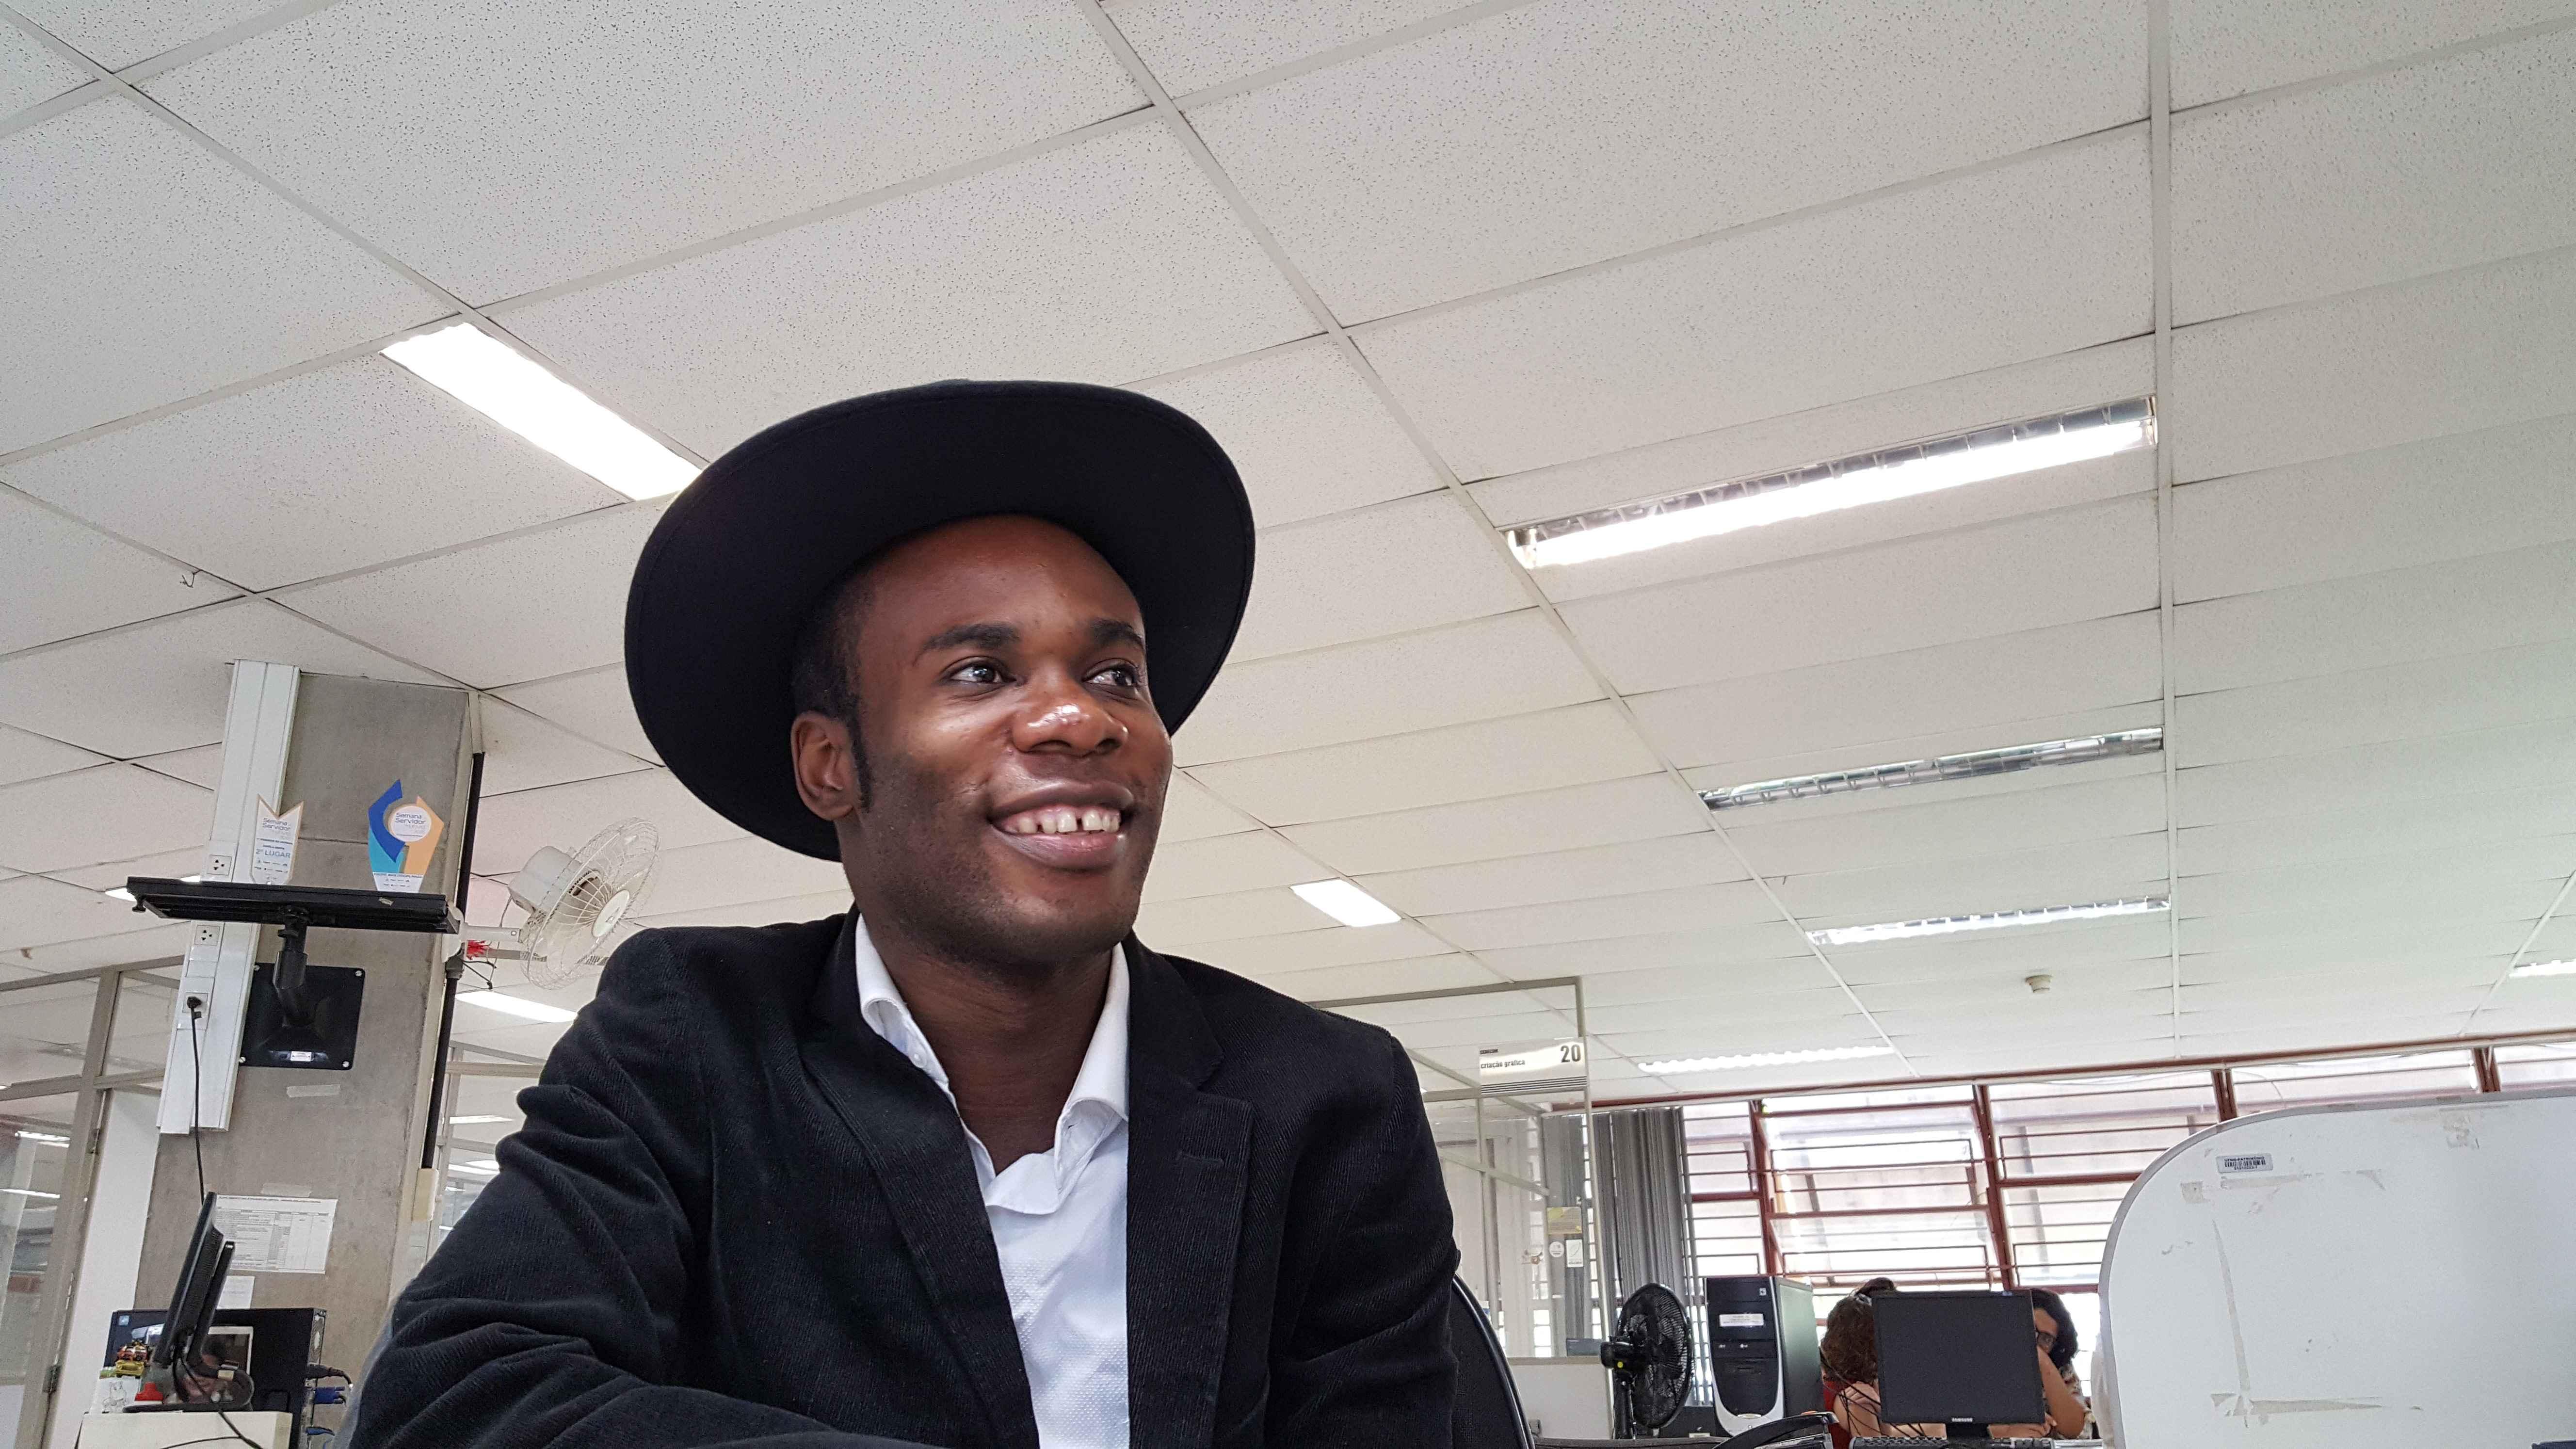 Louison Mbombo, responsável pela organização local do Hult Prize at UFMG on Campus Program